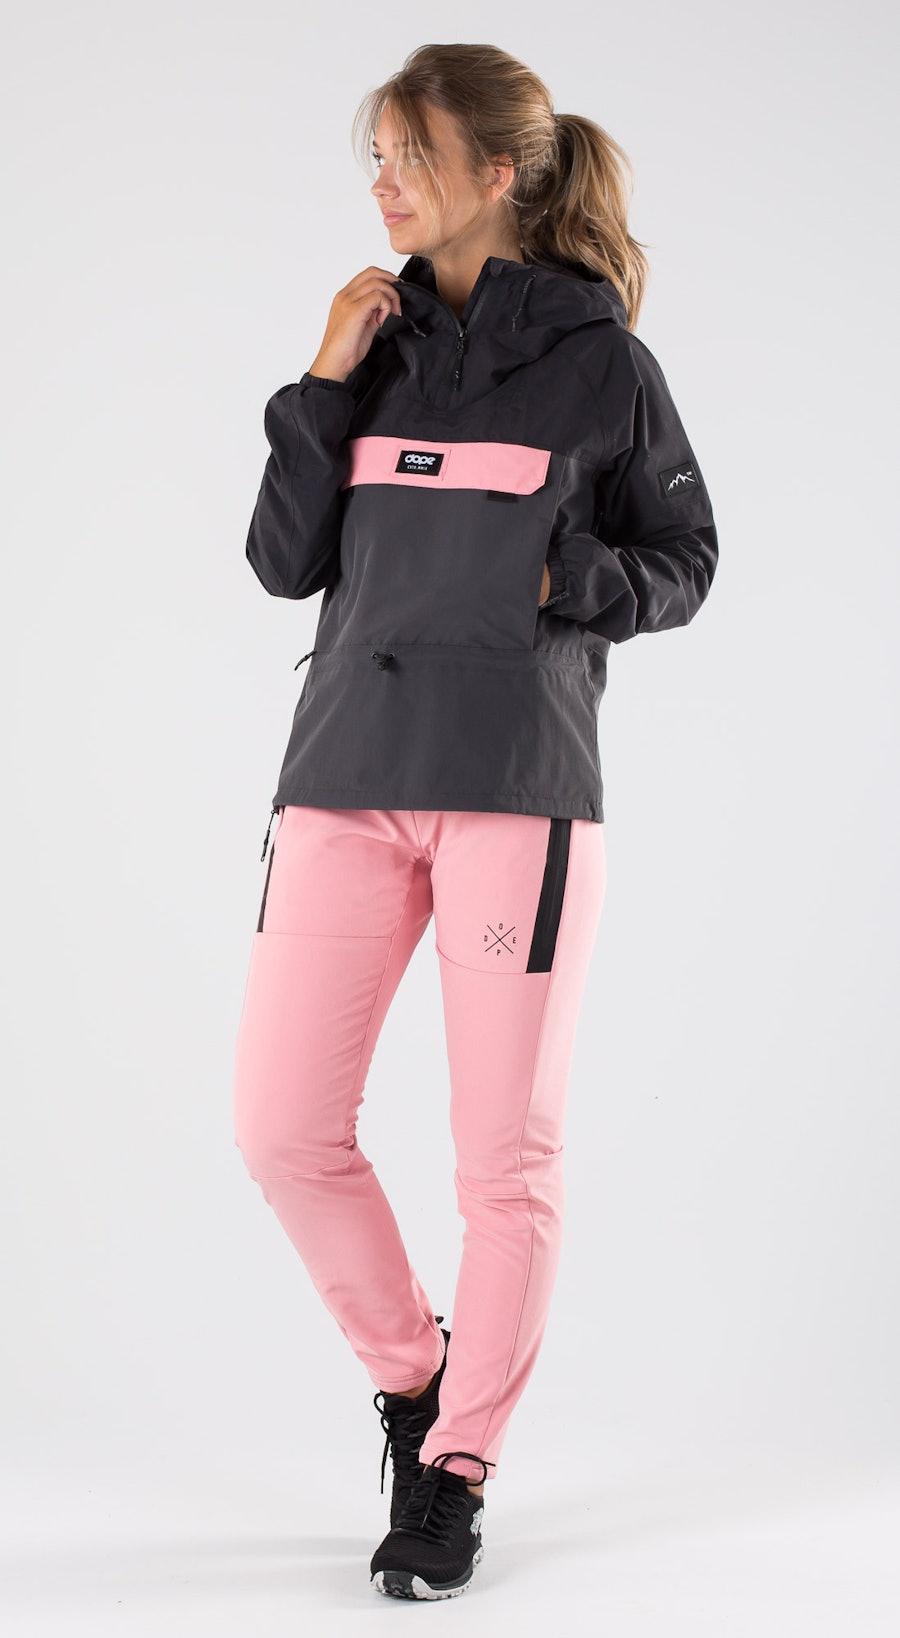 Dope Hiker W Black/Duskgrey/Pink Outfit Multi